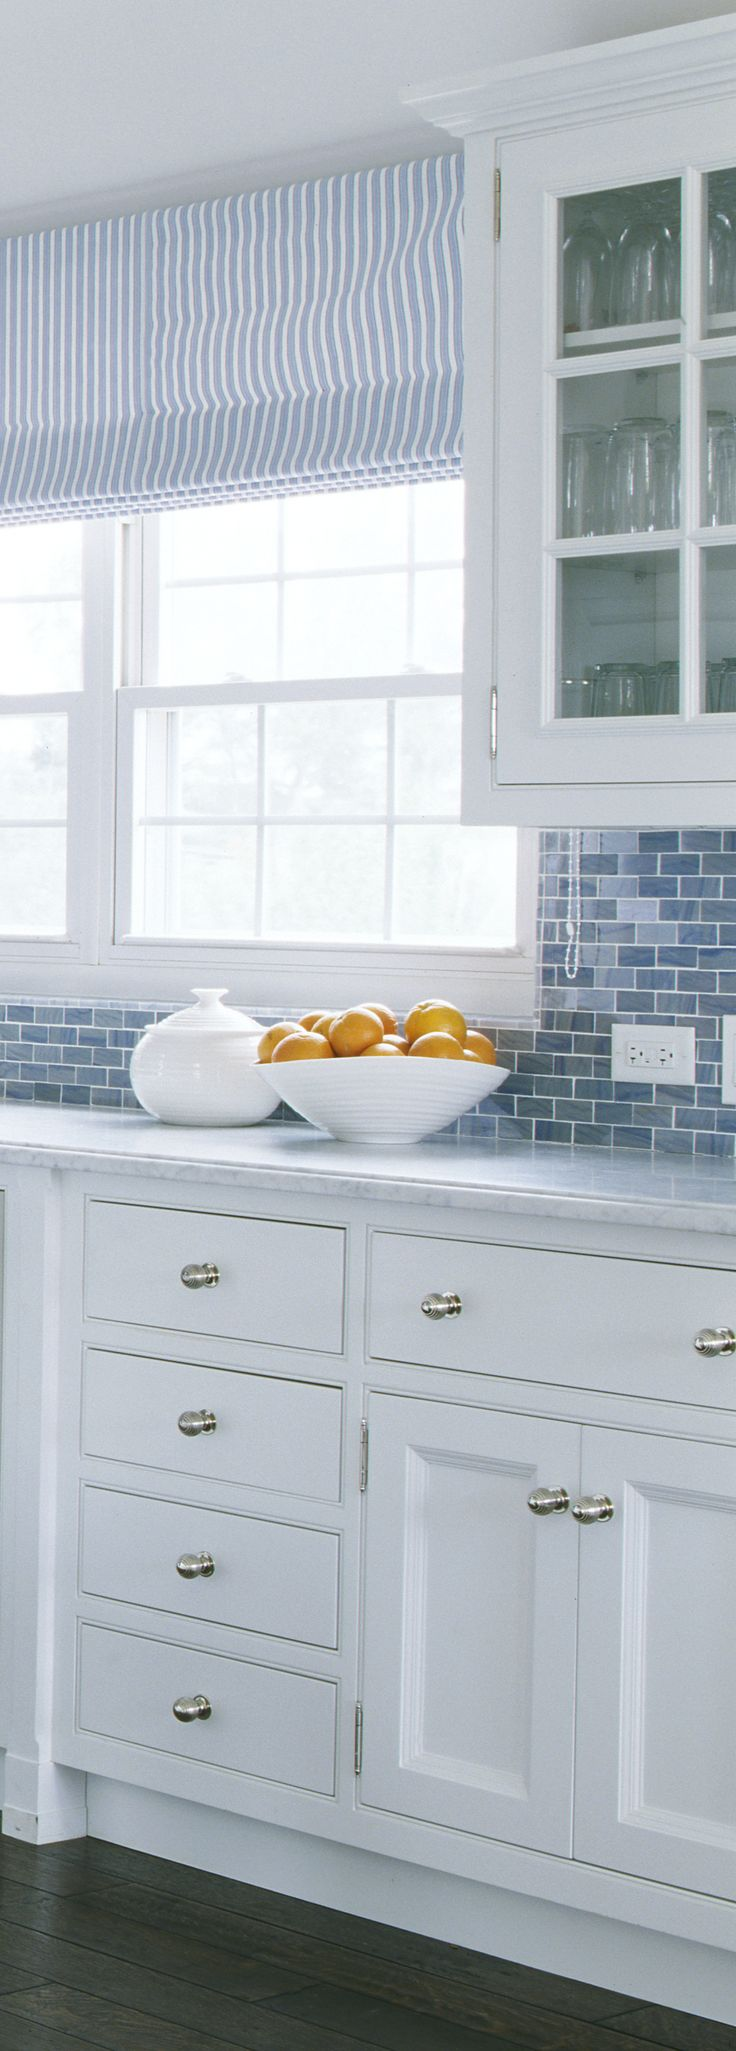 blue and white kitchen has a definite coastal feel to it #kitchens